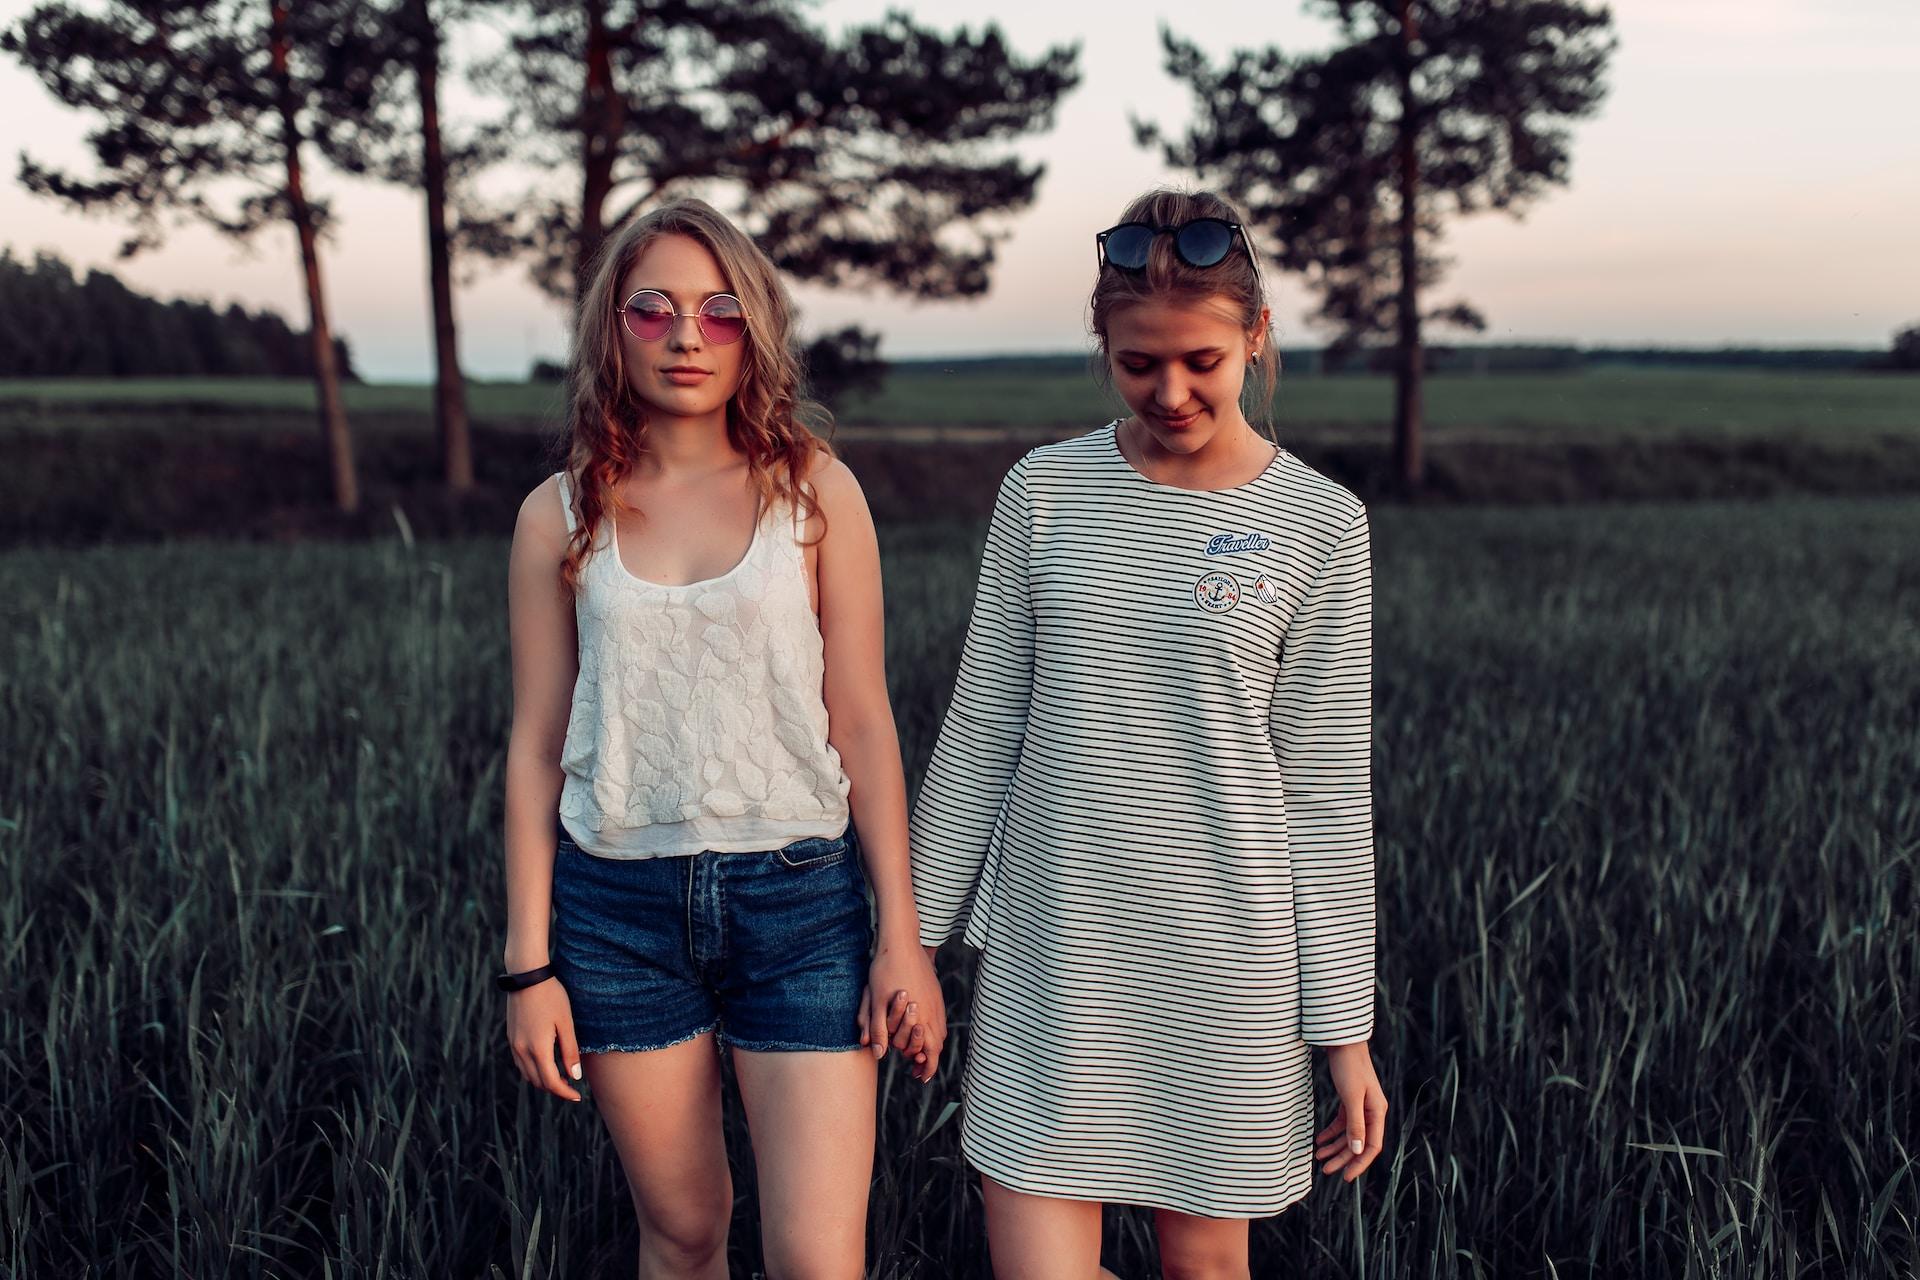 two woman walking on grass land